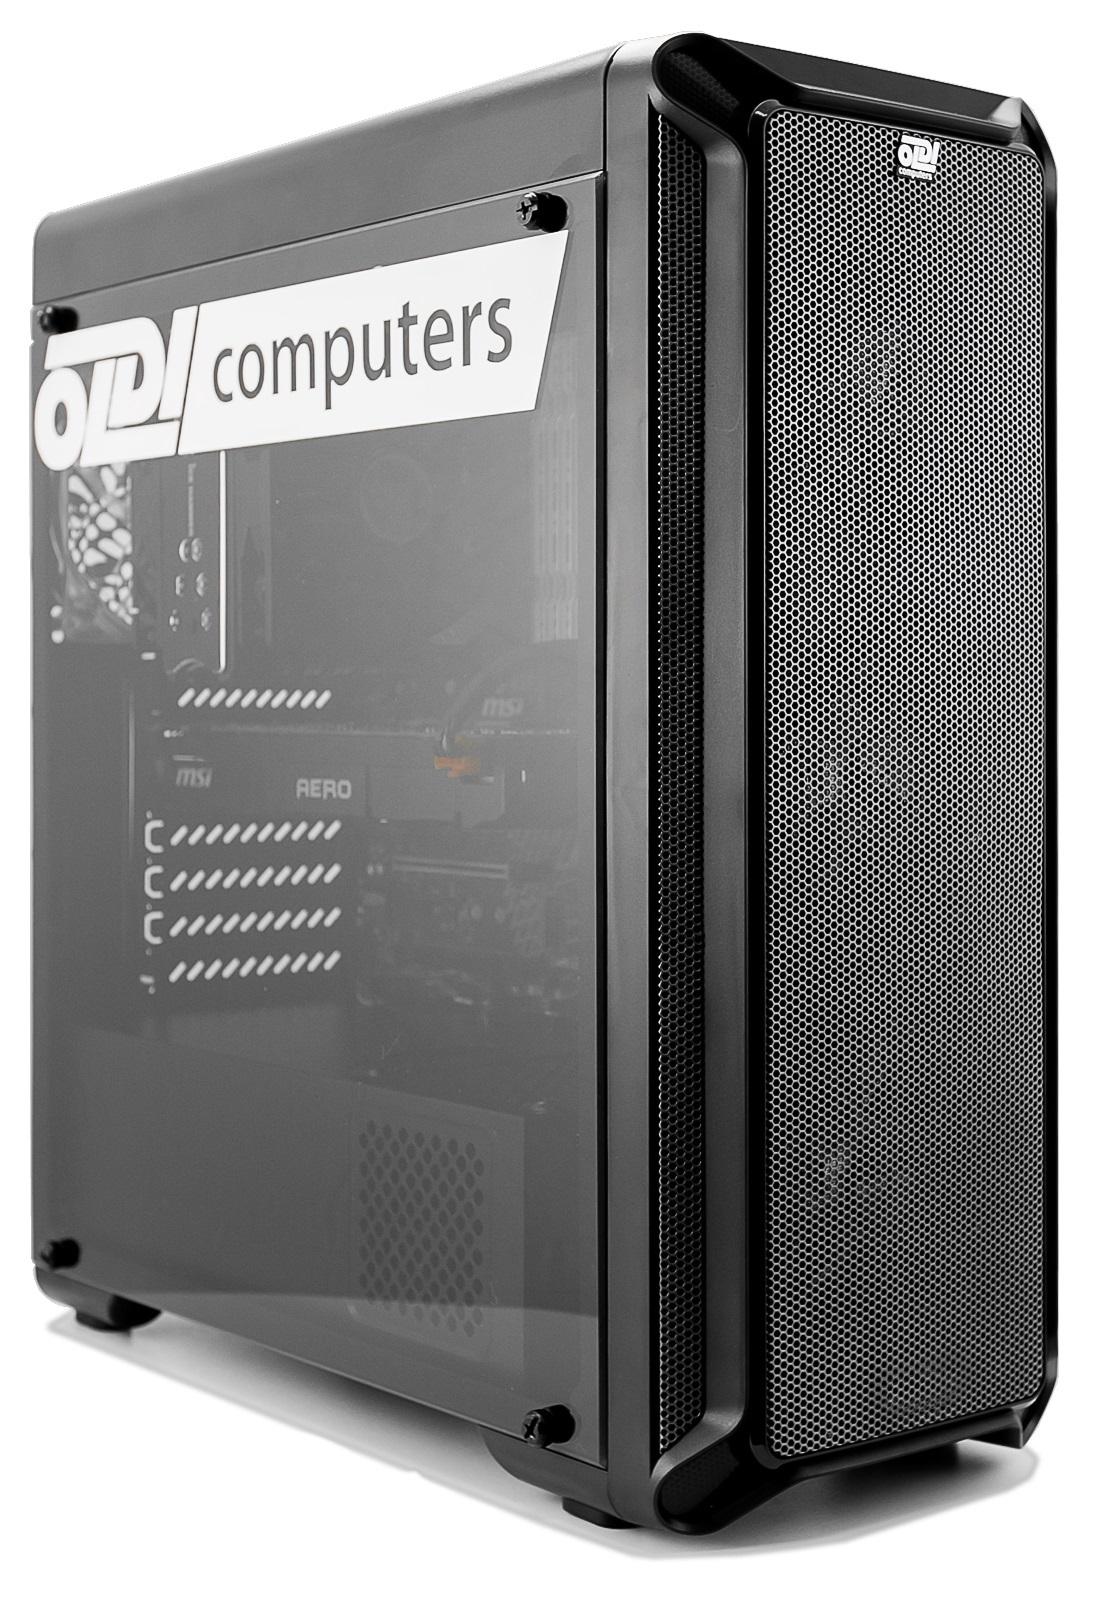 Компьютер Game PC 720 i5-8400/16Gb/Z370/120Gb/8Gb GTX1070Ti/750W/Win10H SL 64-bit retro 8 bit game console with built in 400 classic games